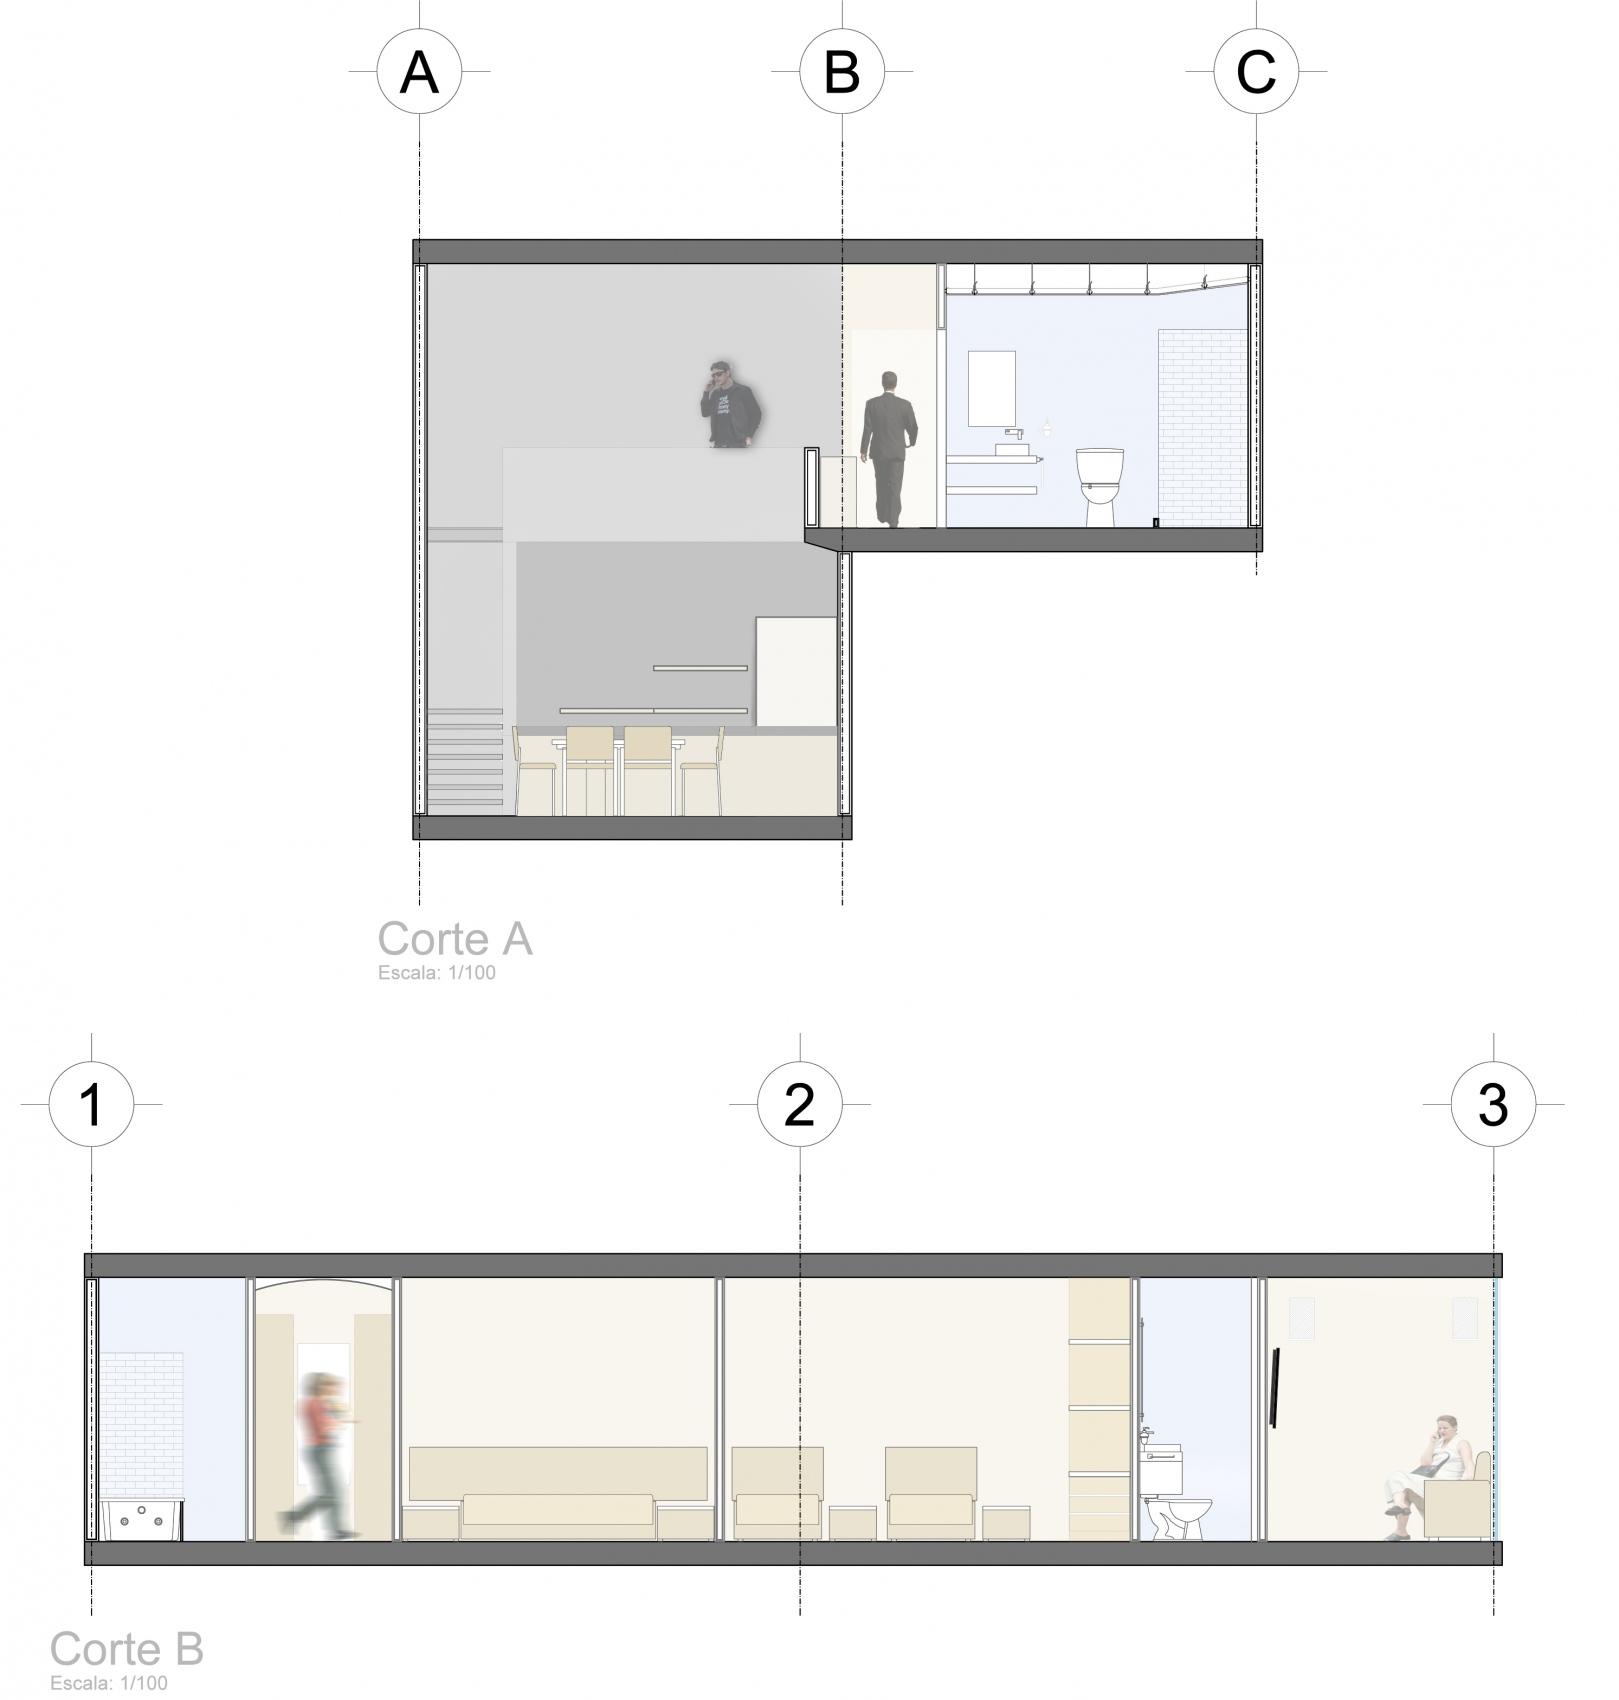 Torre xzavaleta adaptable for Arquitectura nota de corte